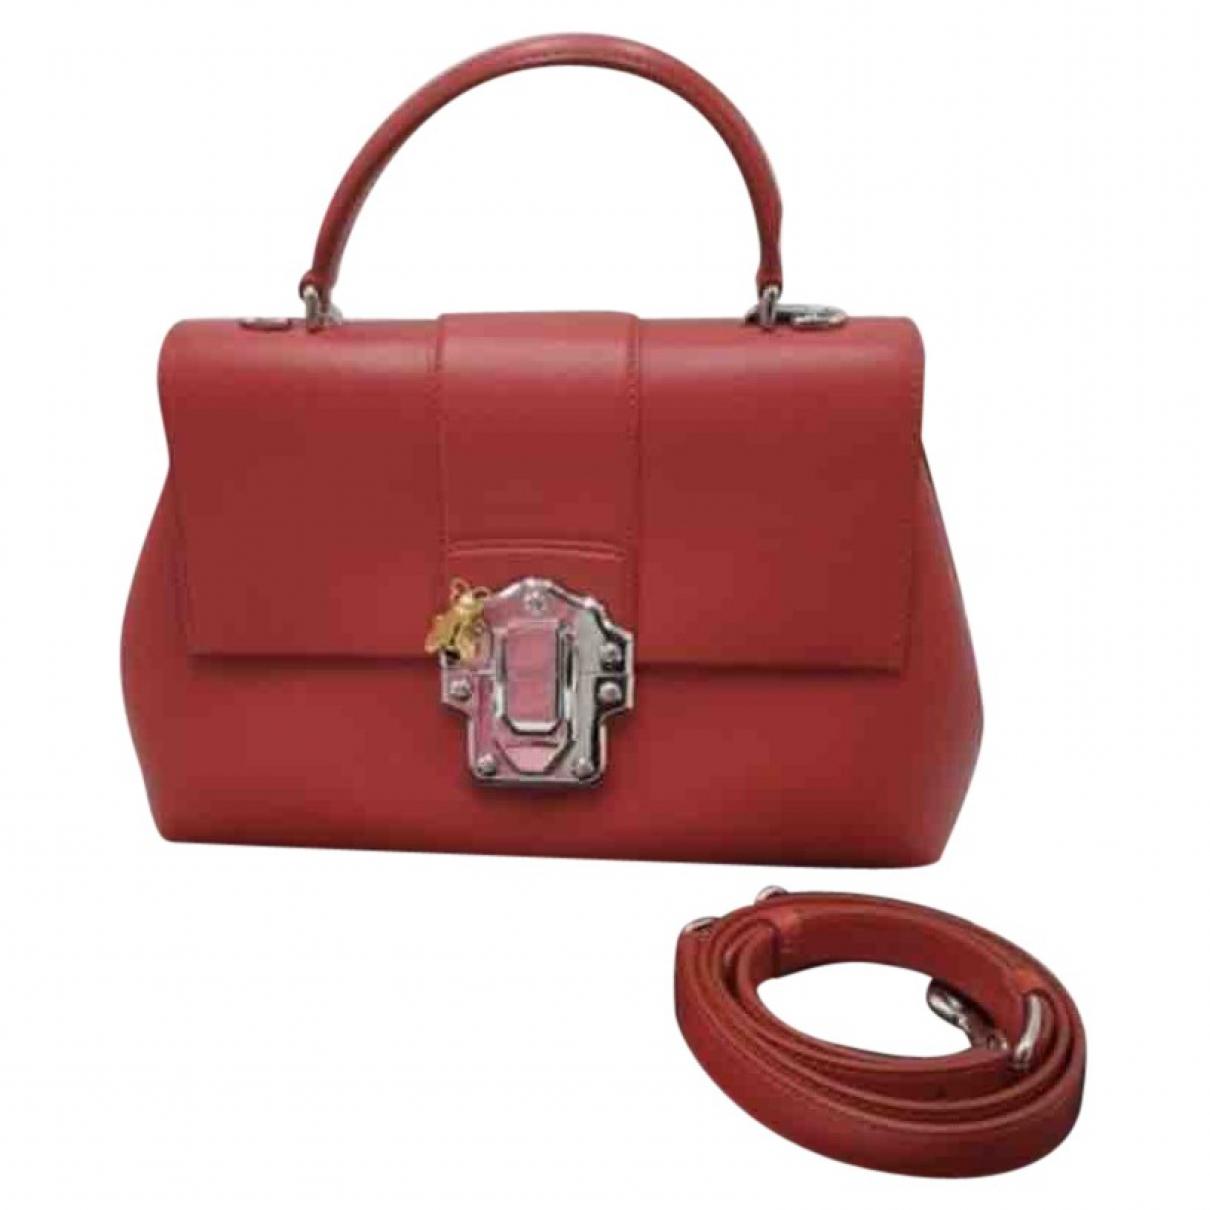 Dolce & Gabbana - Sac a main Lucia pour femme en cuir - rouge